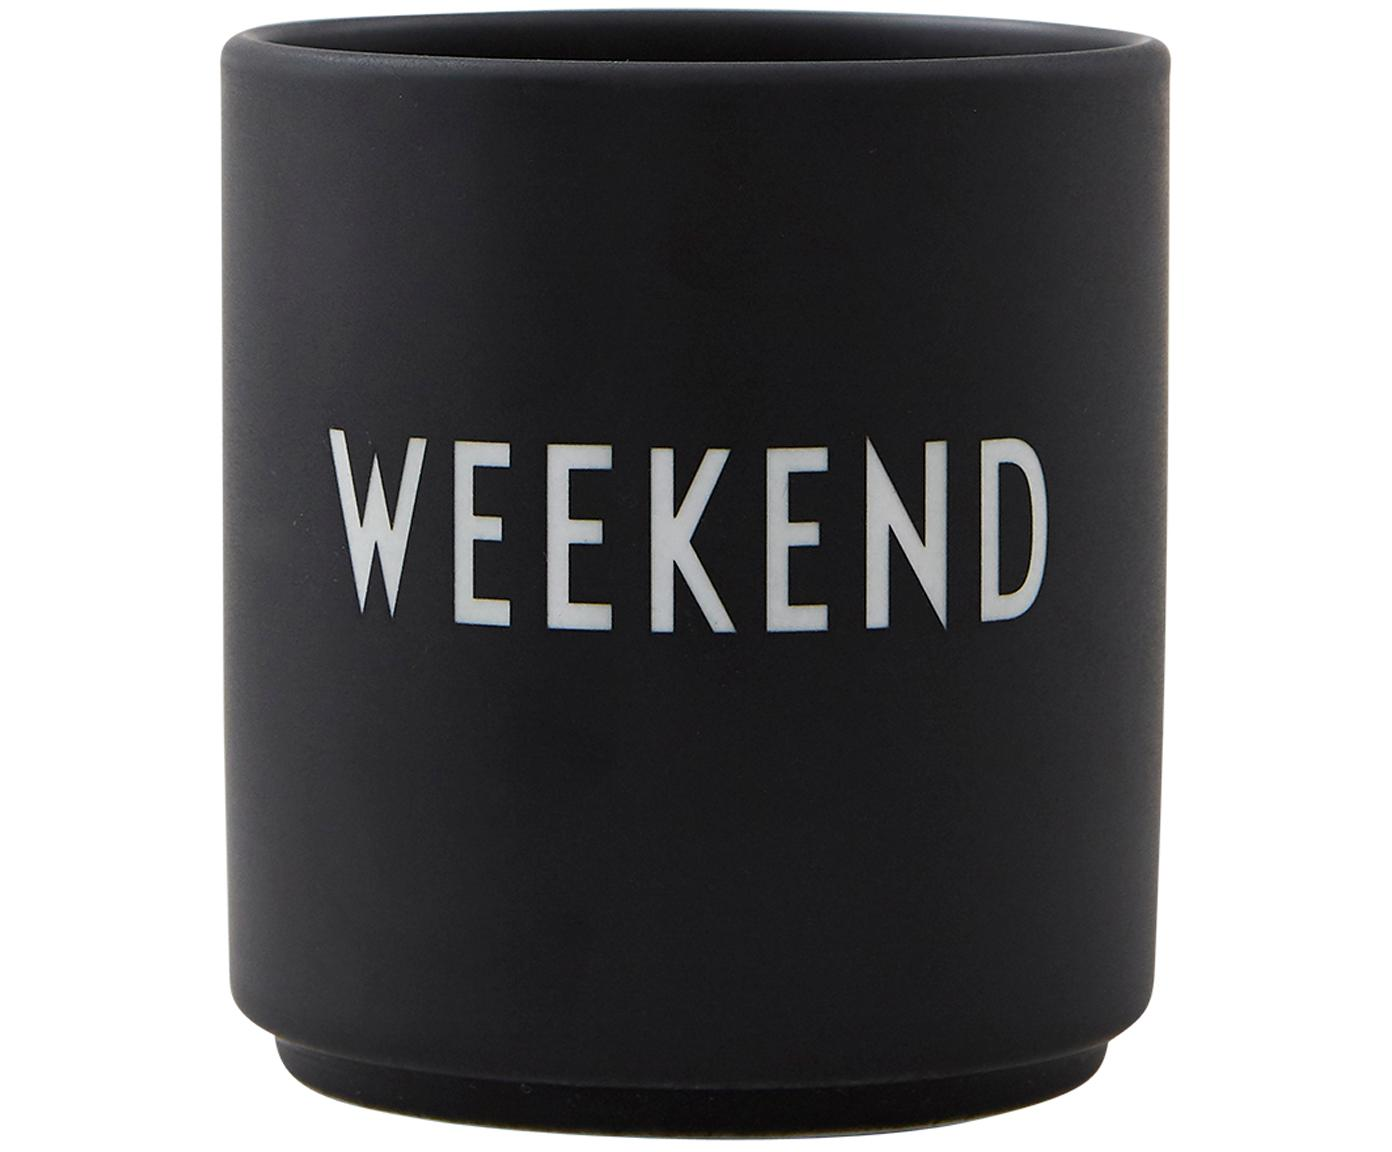 Taza de diseño Favourite, Porcelana fina, esmaltado, Negro, blanco, Ø 8 x Al 9 cm